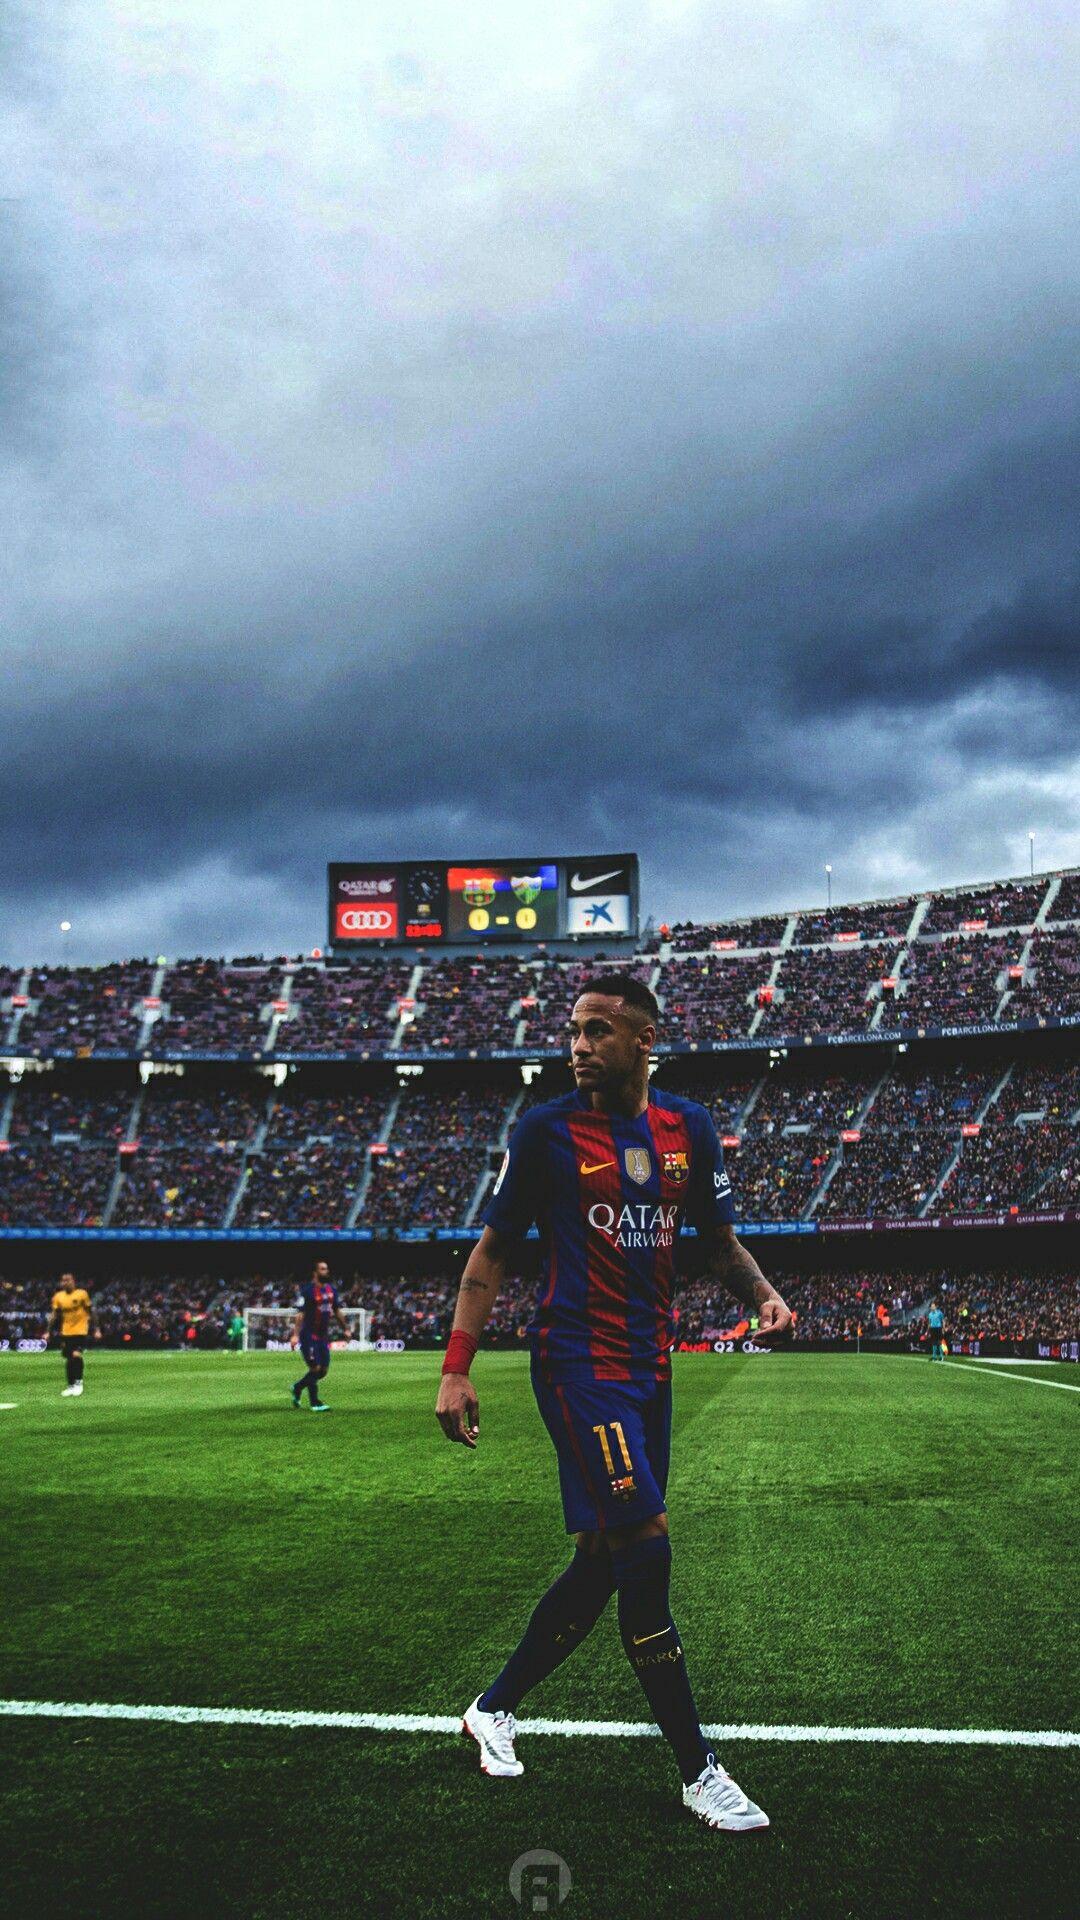 Neymar Futebol neymar, Jogadores de futebol, Futebol